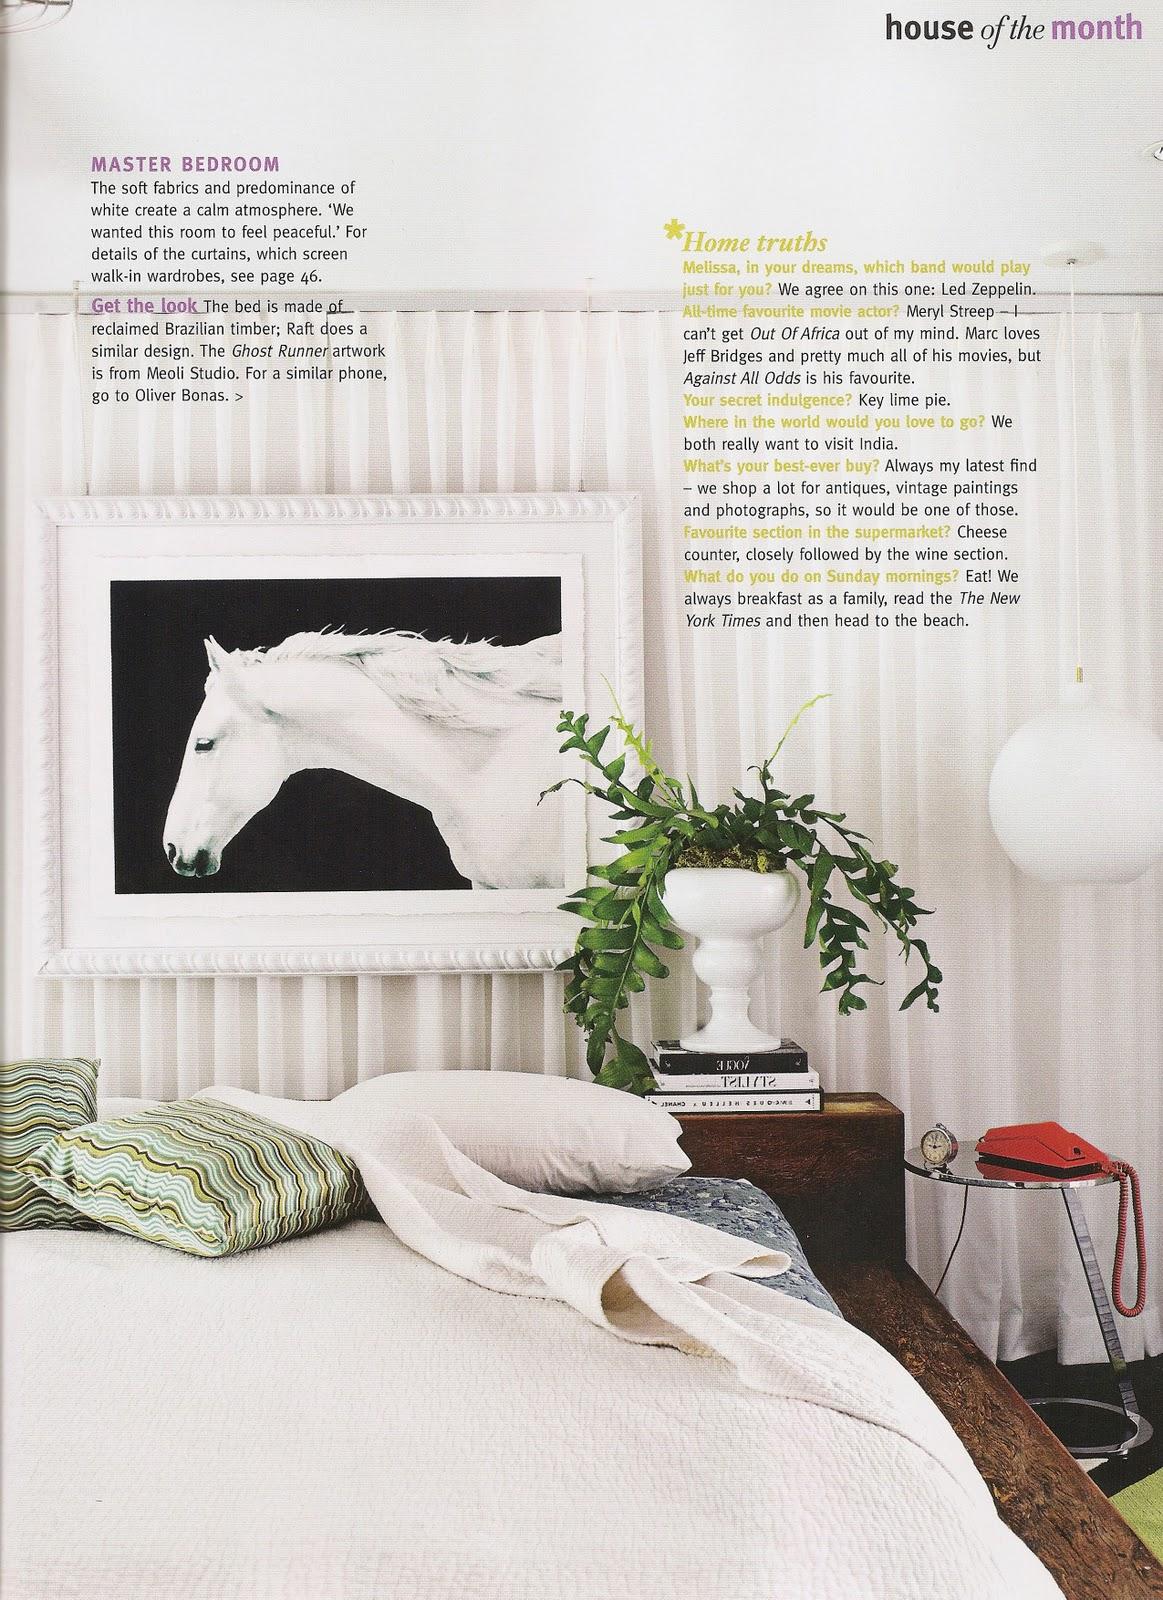 http://2.bp.blogspot.com/_DbiPXrC6v5Q/TDzBt9BCoyI/AAAAAAAAAt8/F99g9v49FG4/s1600/bedroom.jpg